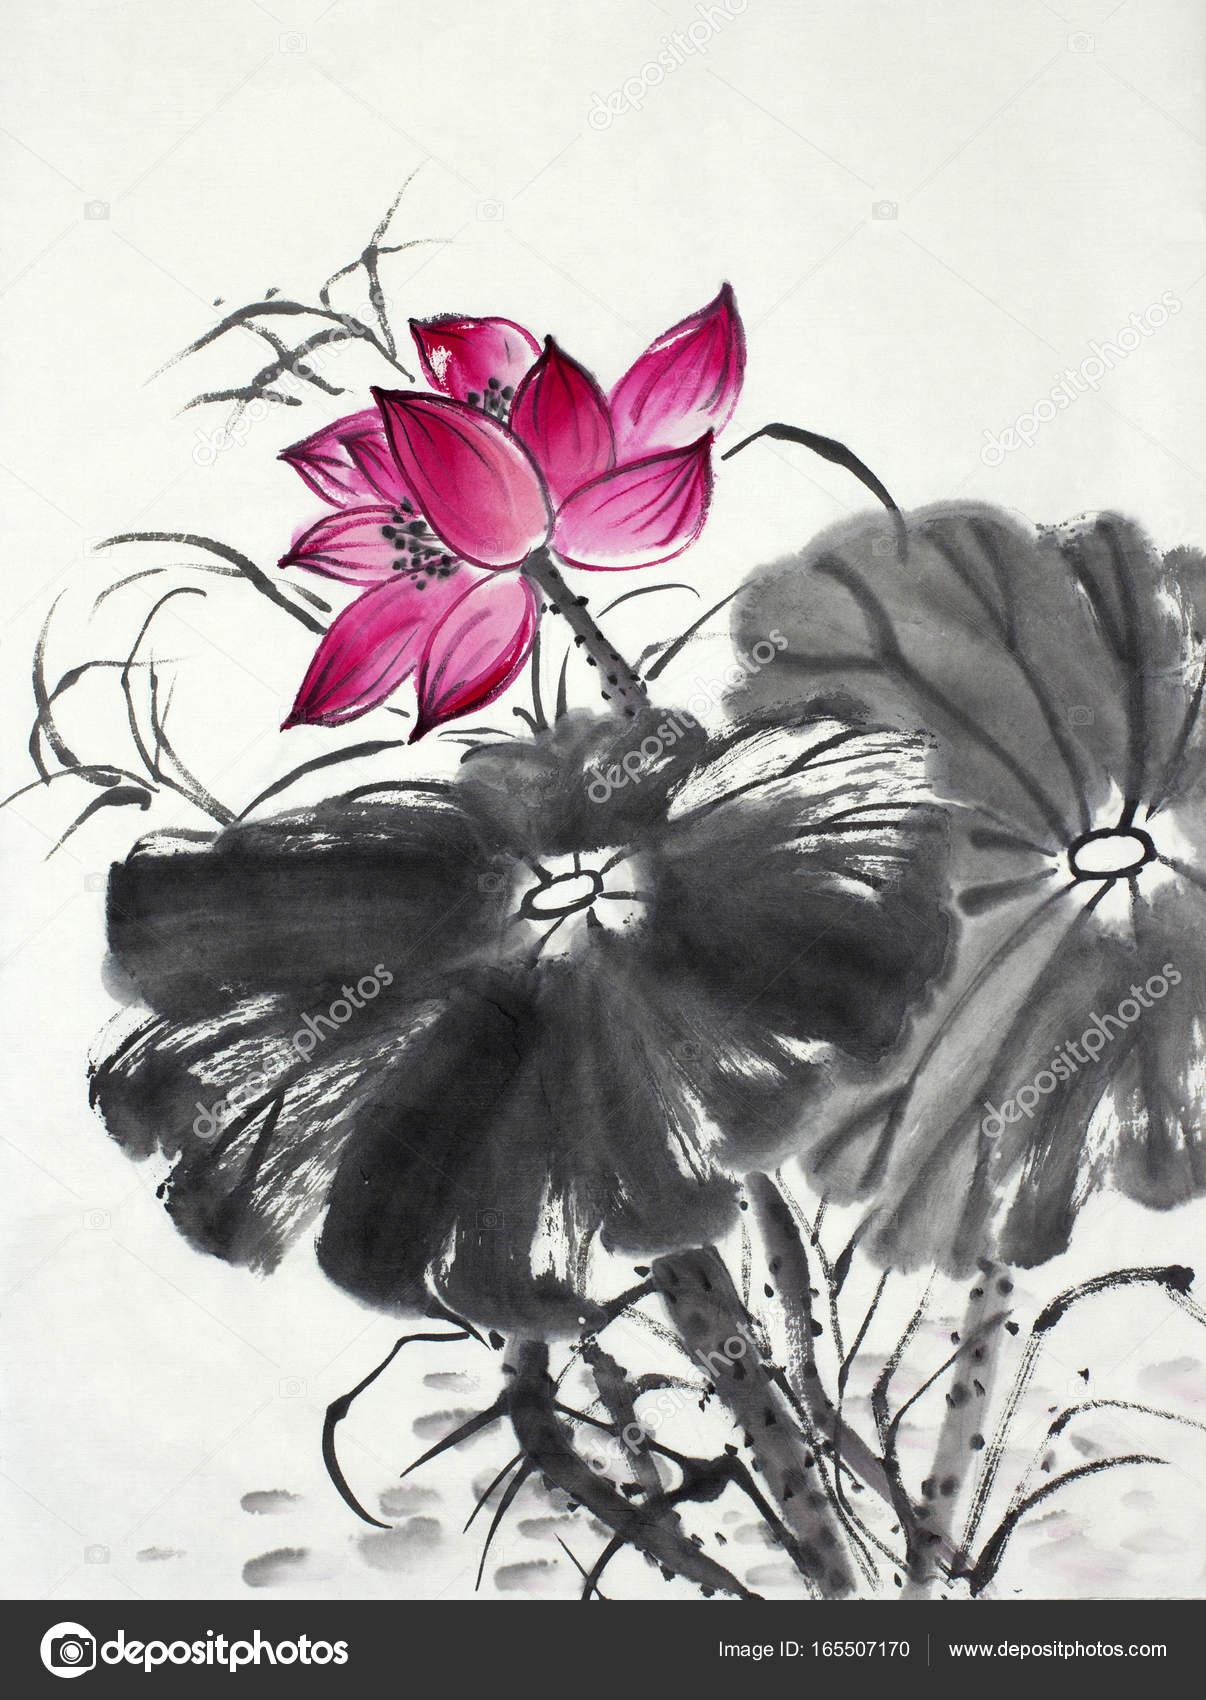 Bright lotus flower stock photo nikolai2 165507170 bright lotus flower painted in chinese style photo by nikolai2 izmirmasajfo